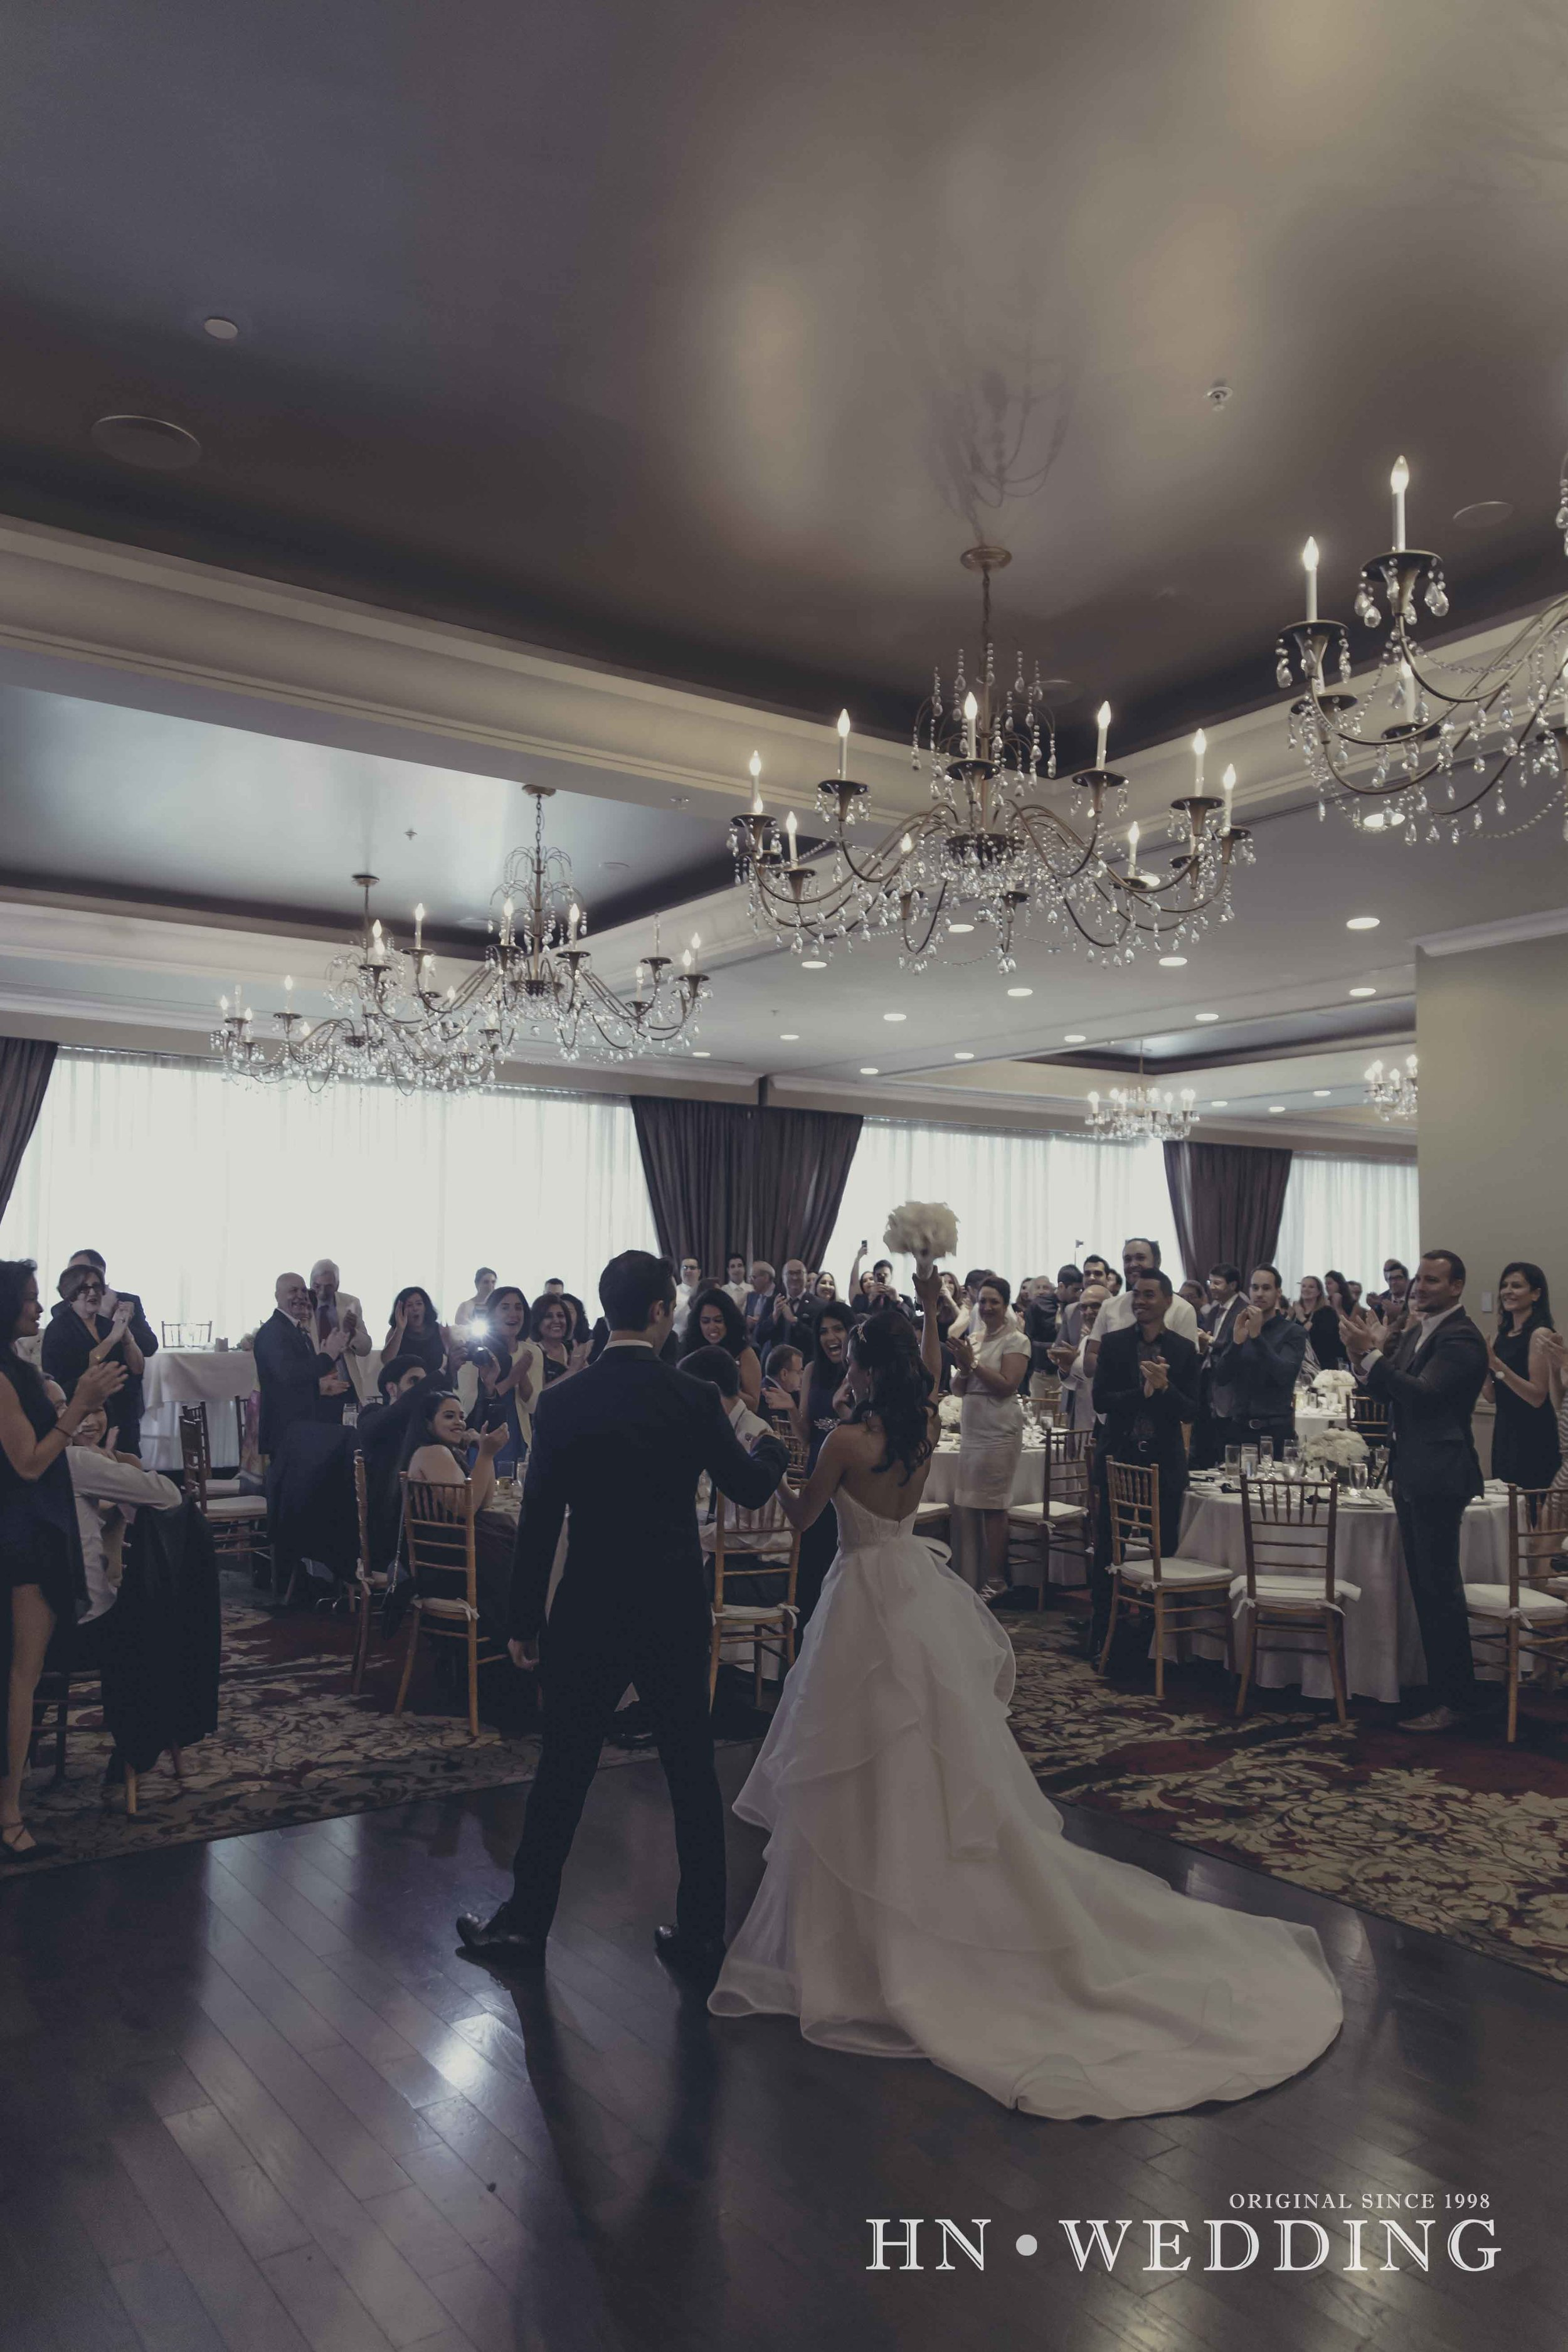 HNwedding-20161012-wedding-4390.jpg